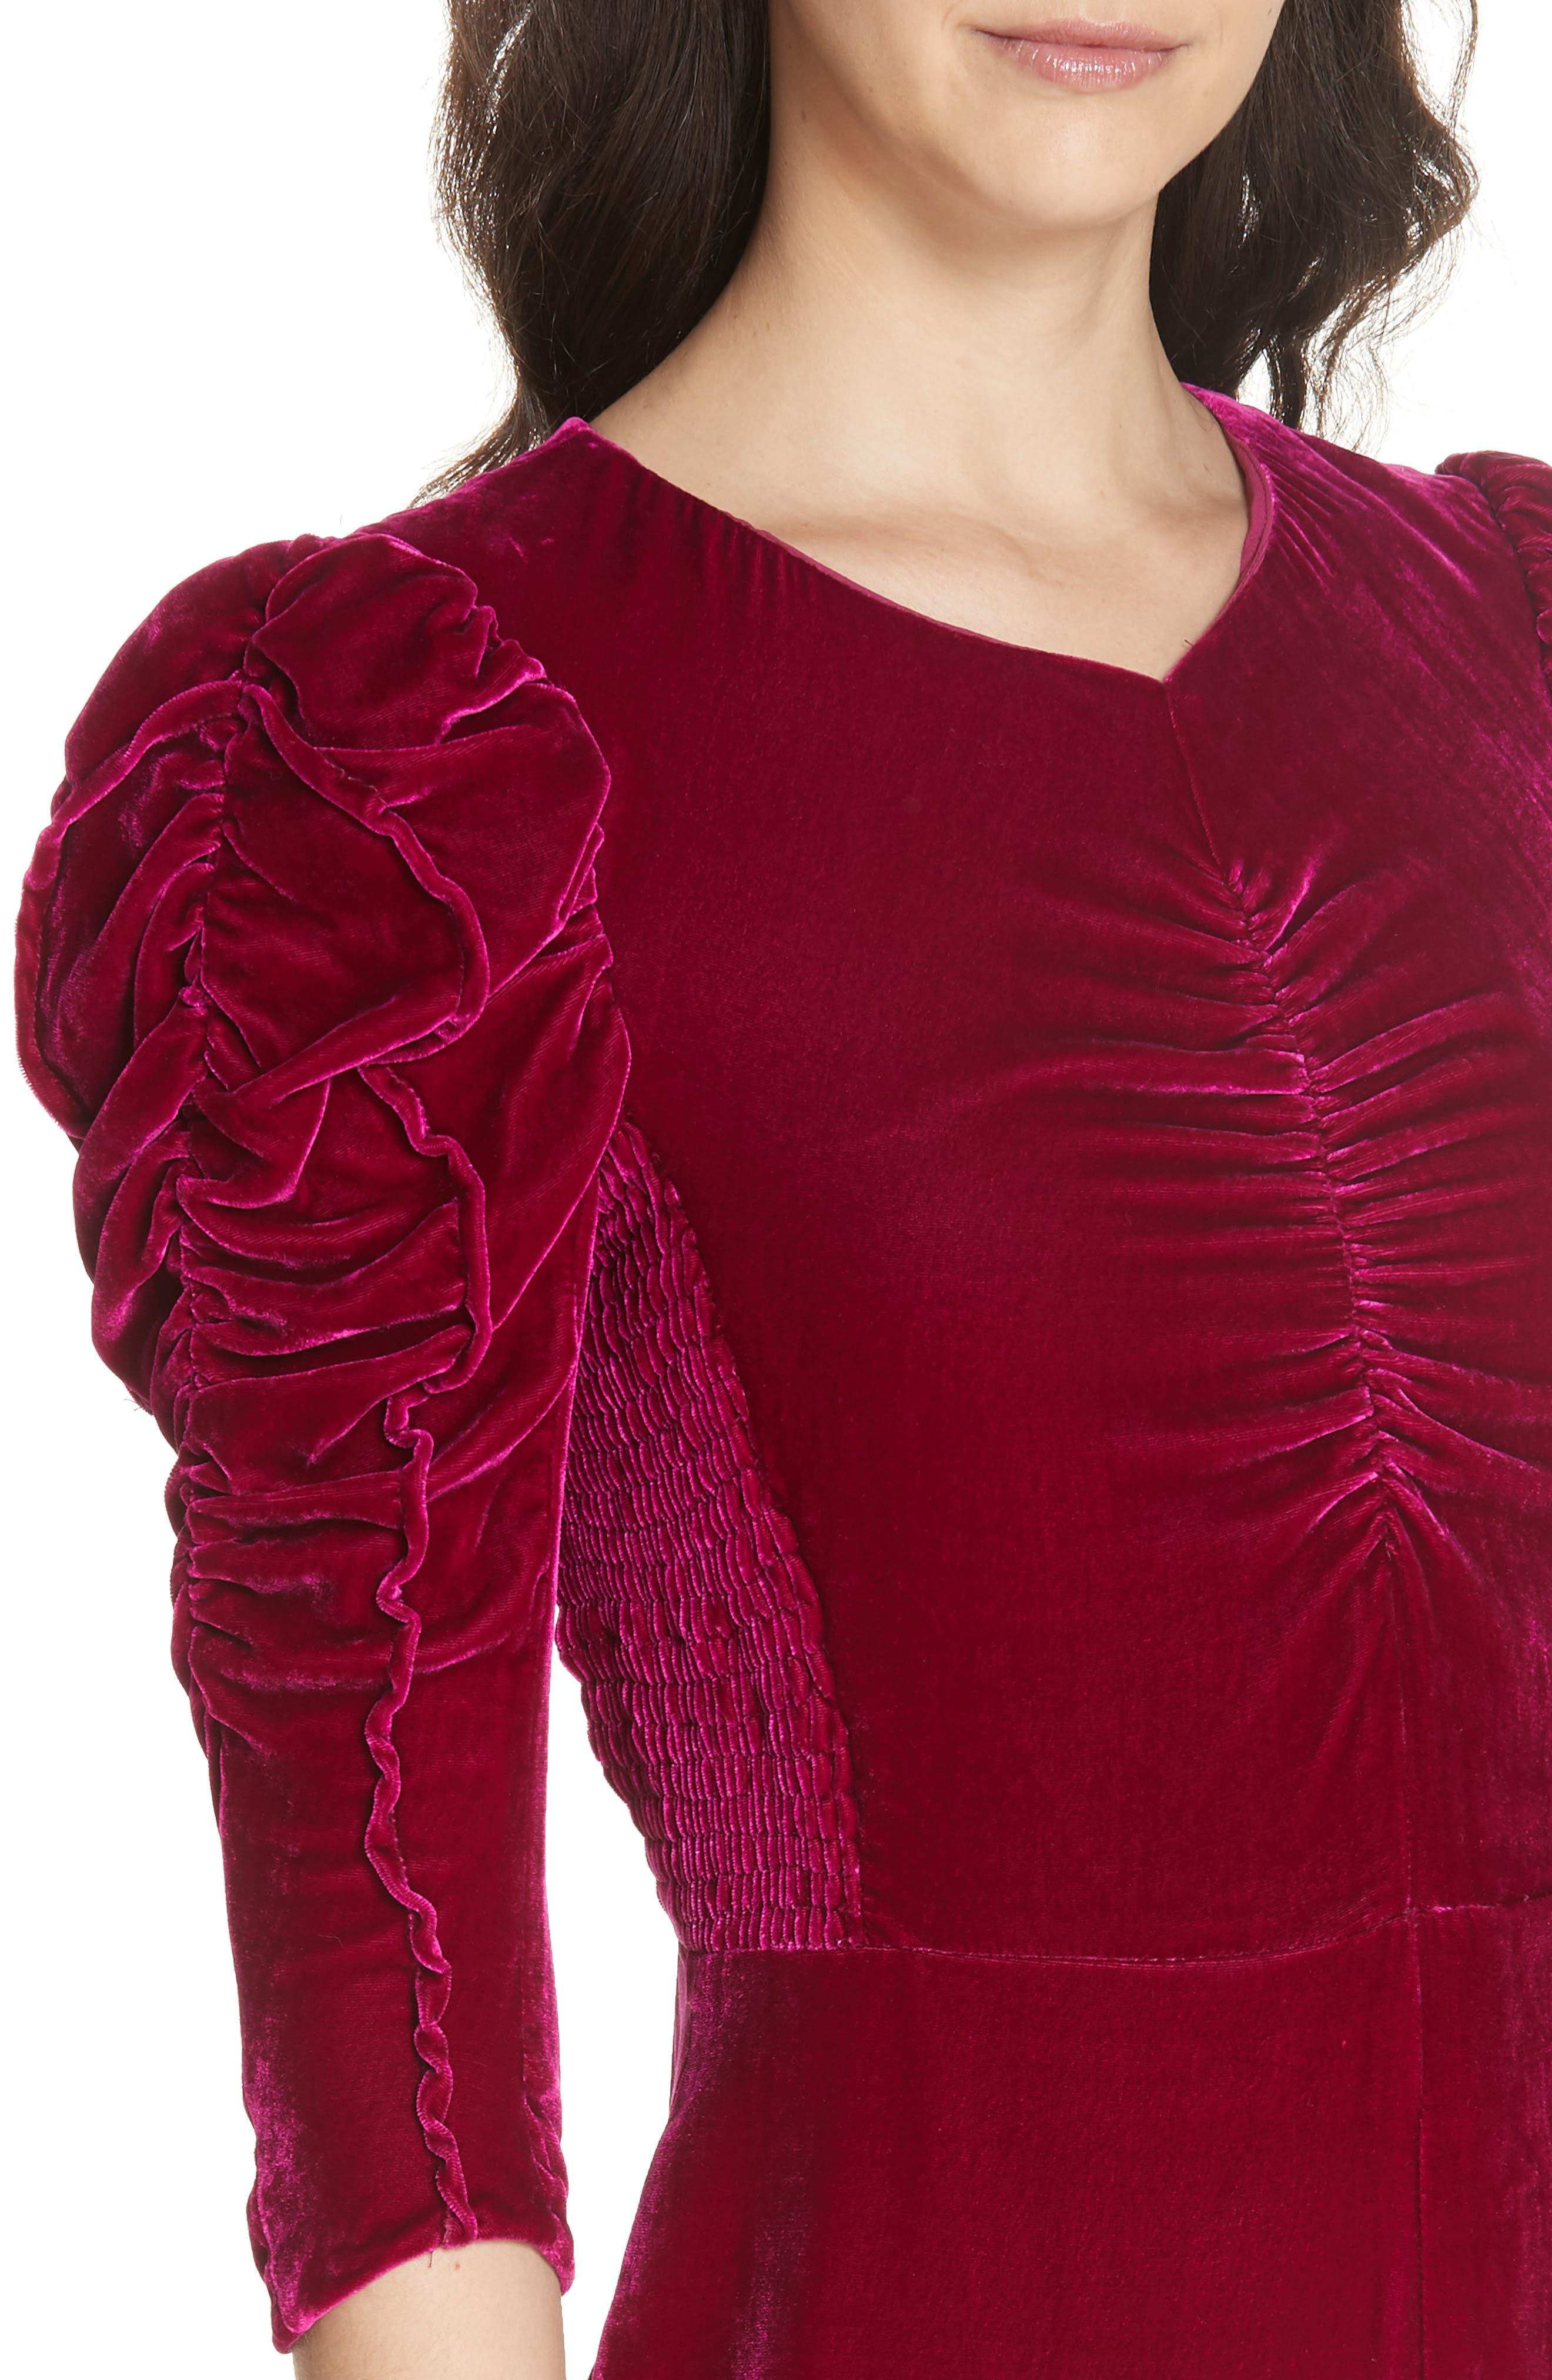 Ruched Velvet Dress,                             Alternate thumbnail 4, color,                             CRANBERRY